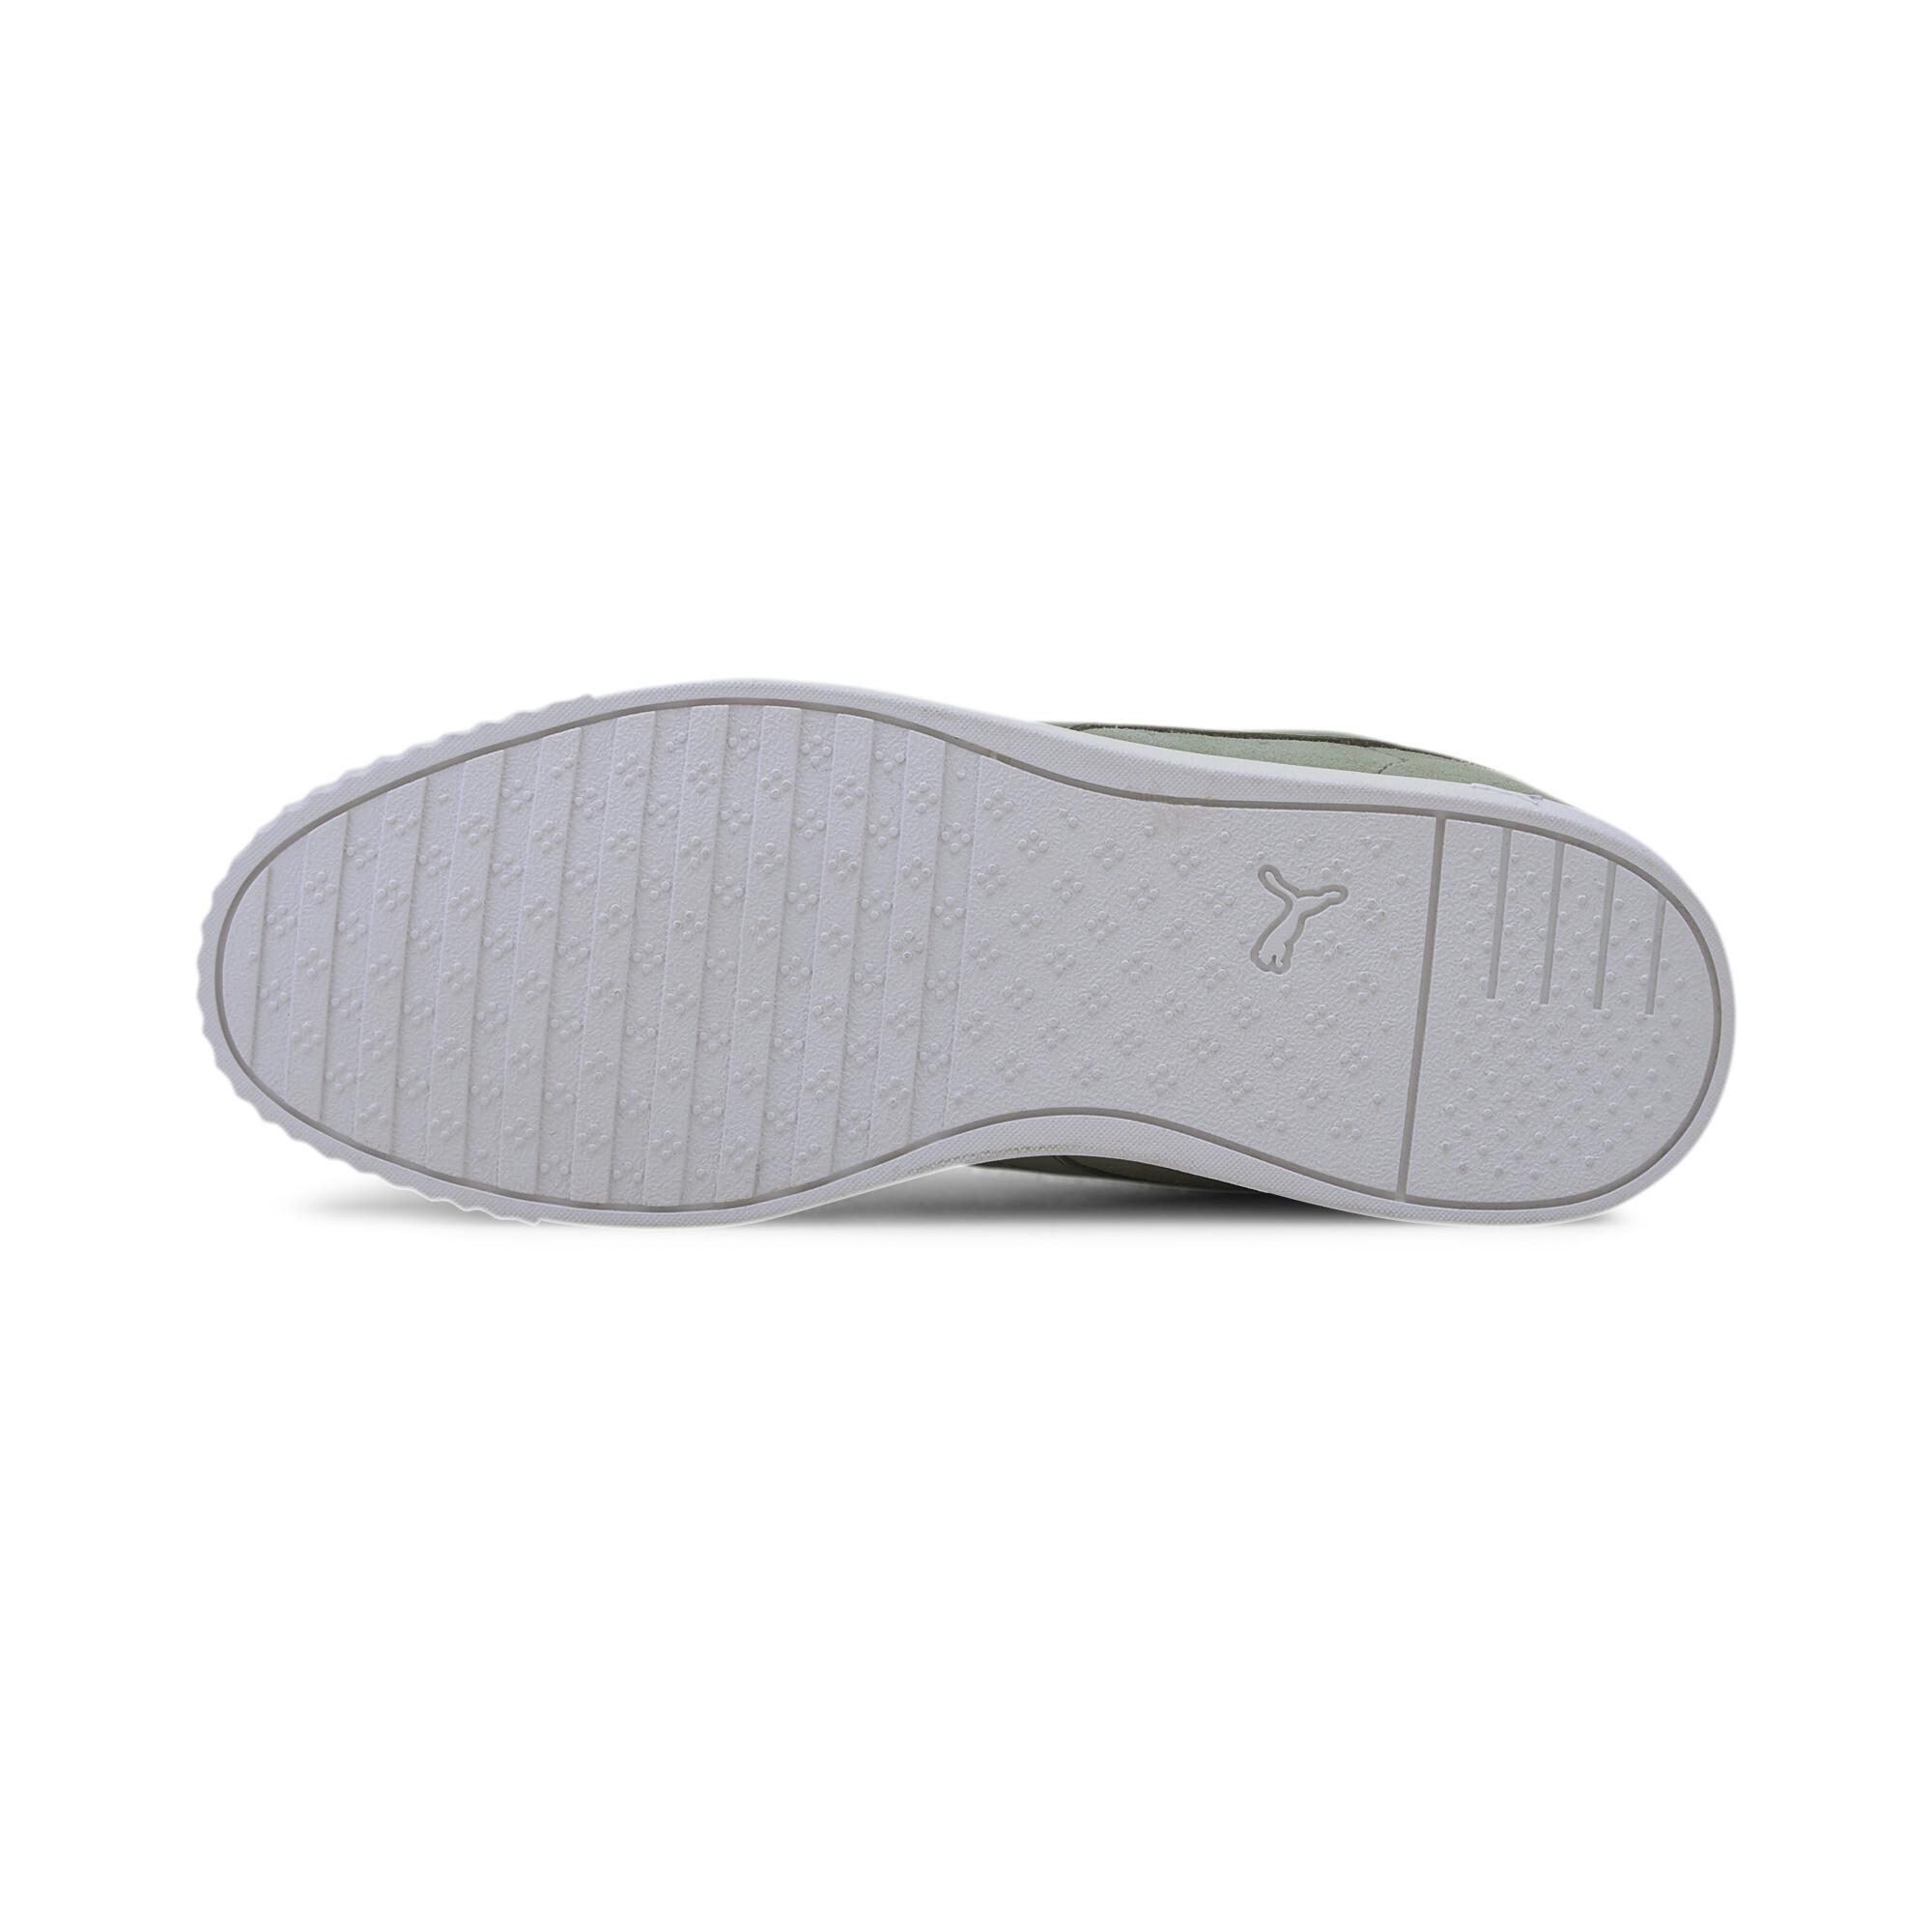 PUMA-Women-039-s-Carina-Slim-Suede-Sneakers thumbnail 26